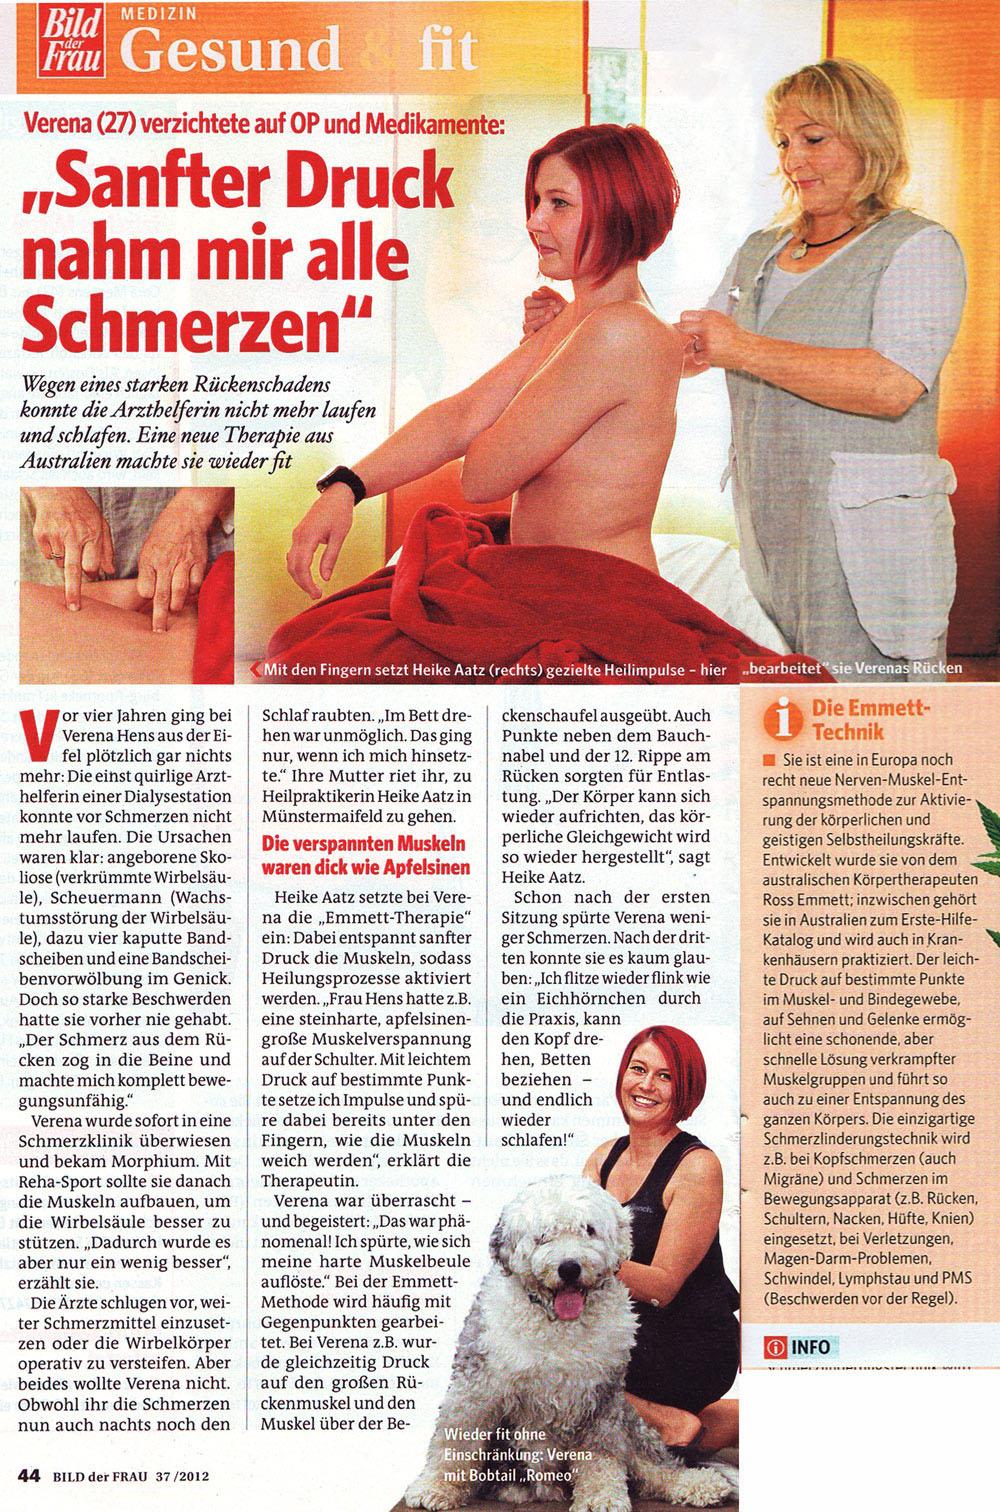 Emmett-Therapie Ergofuchs Passau